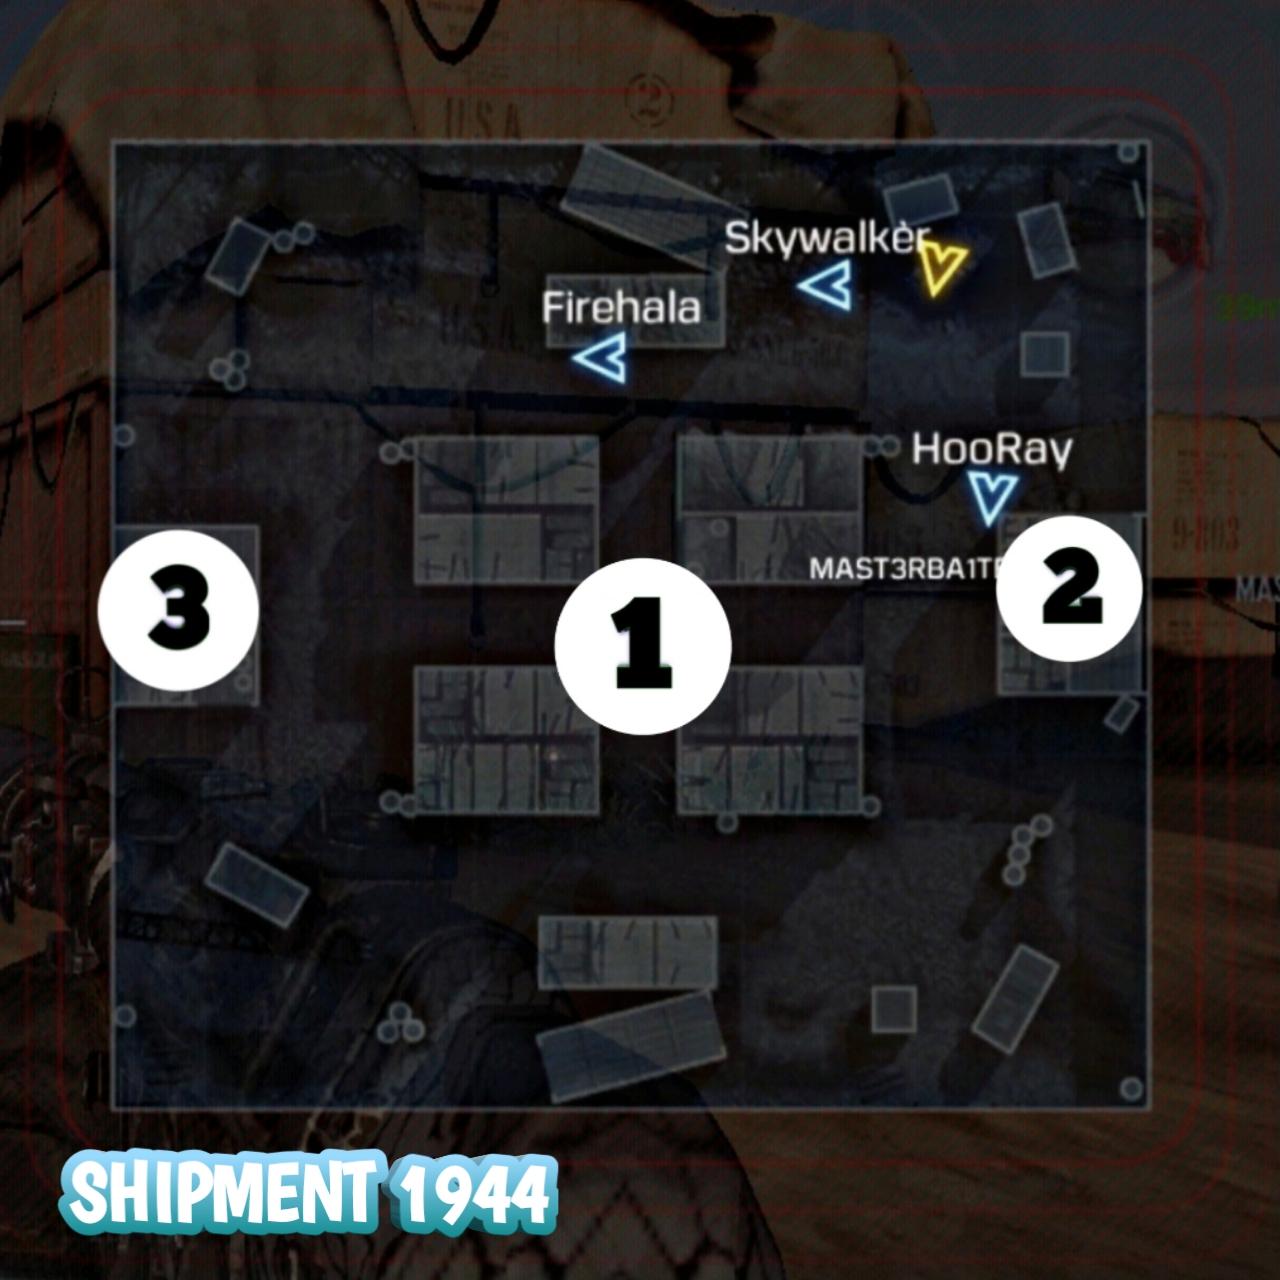 Shipment 1944 Hardpoint location